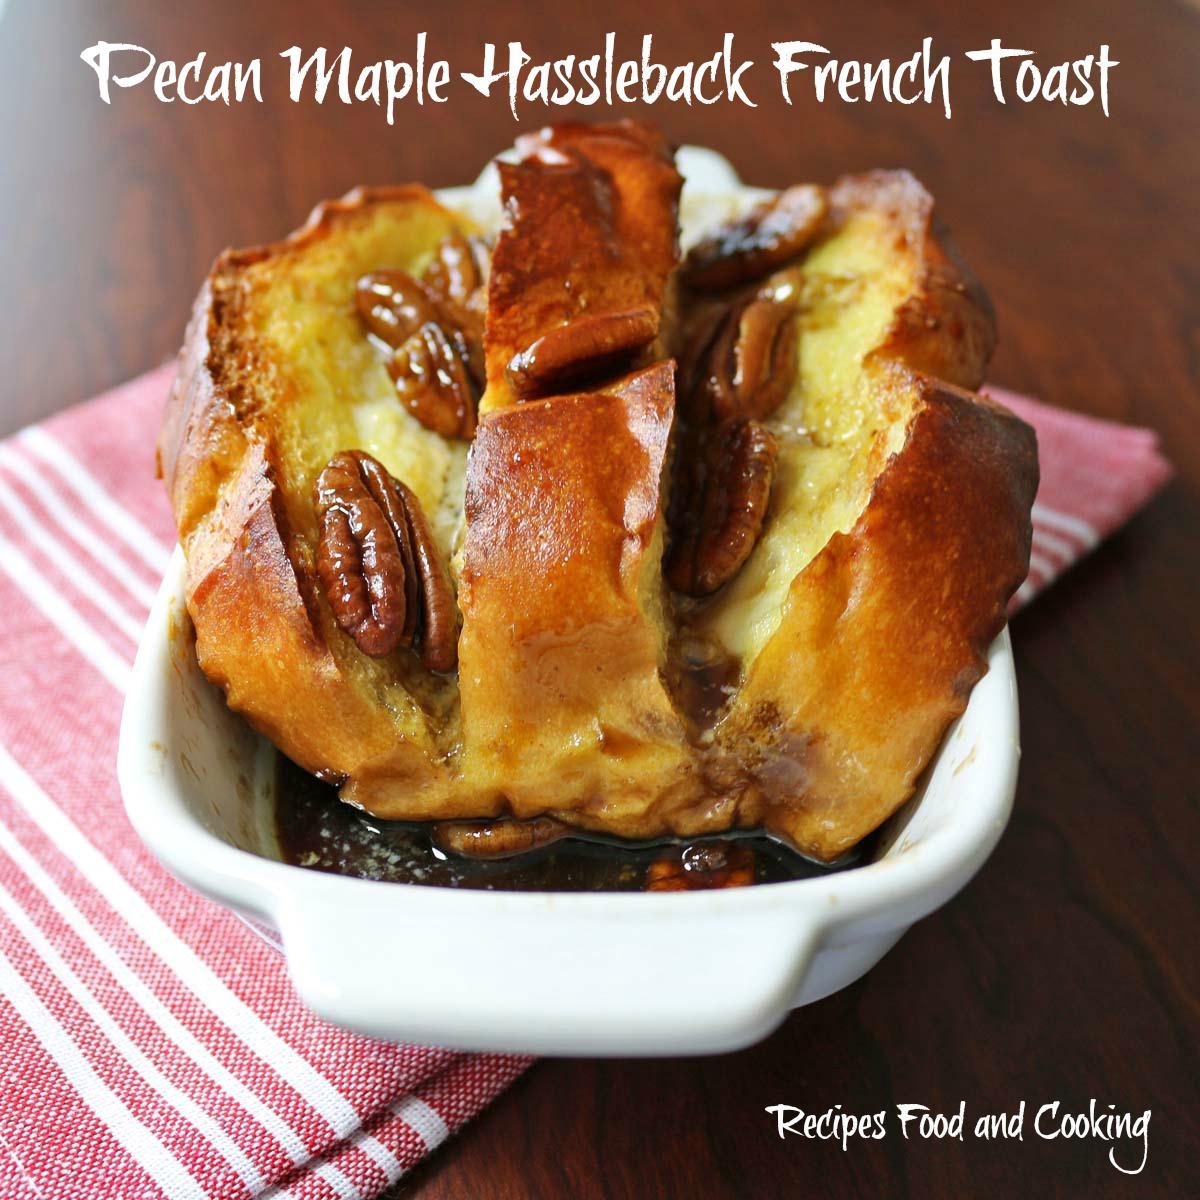 Pecan Maple Hassleback French Toast